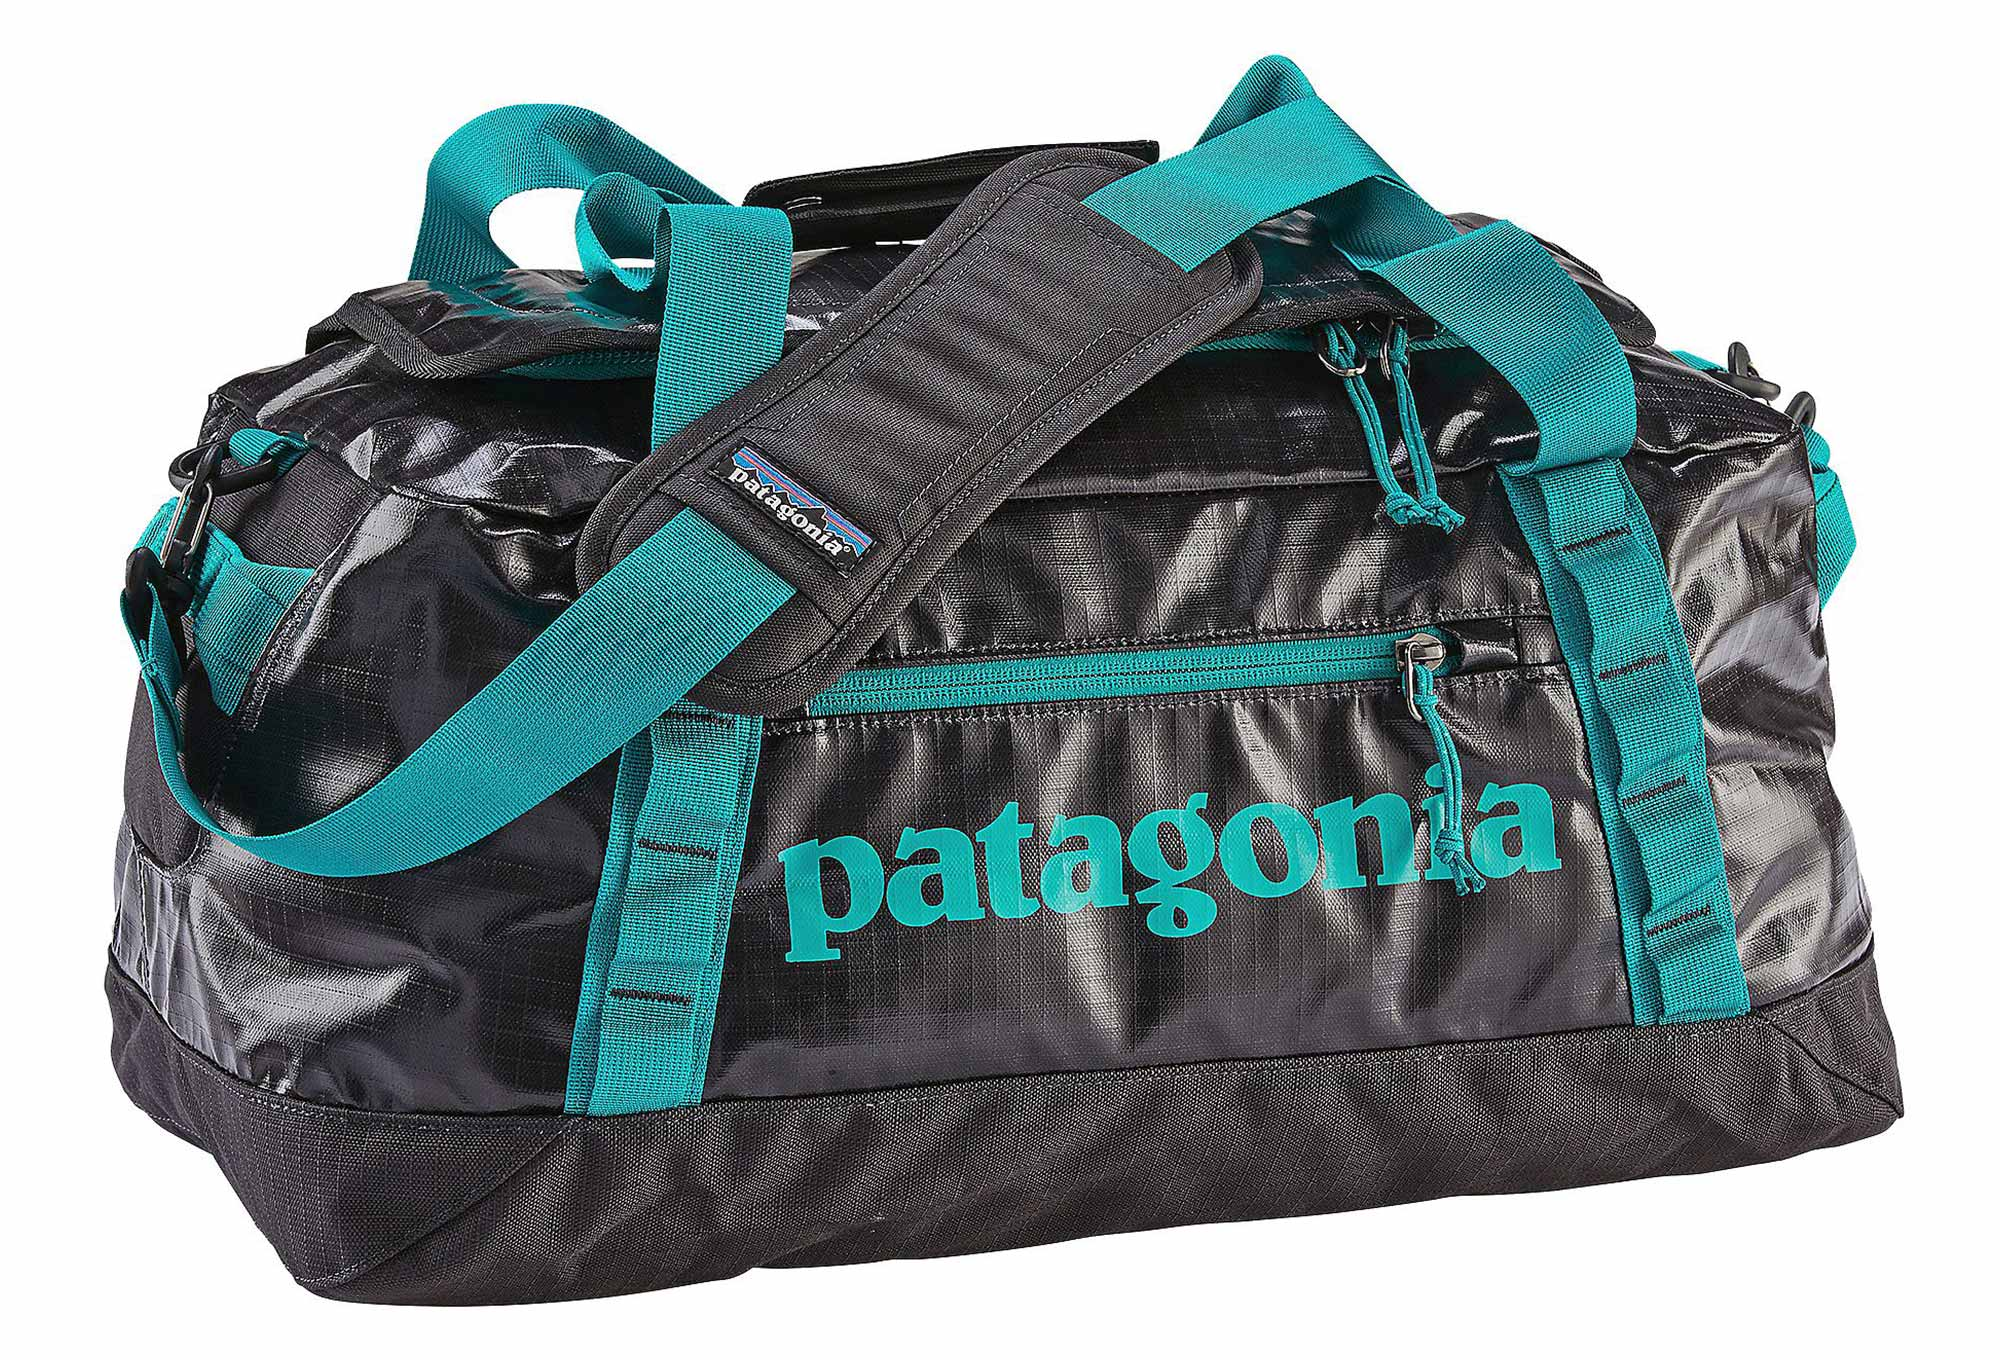 57c3eaa5e9e Sac de Voyage Patagonia Black Hole 45L Noir Bleu Turquoise ...